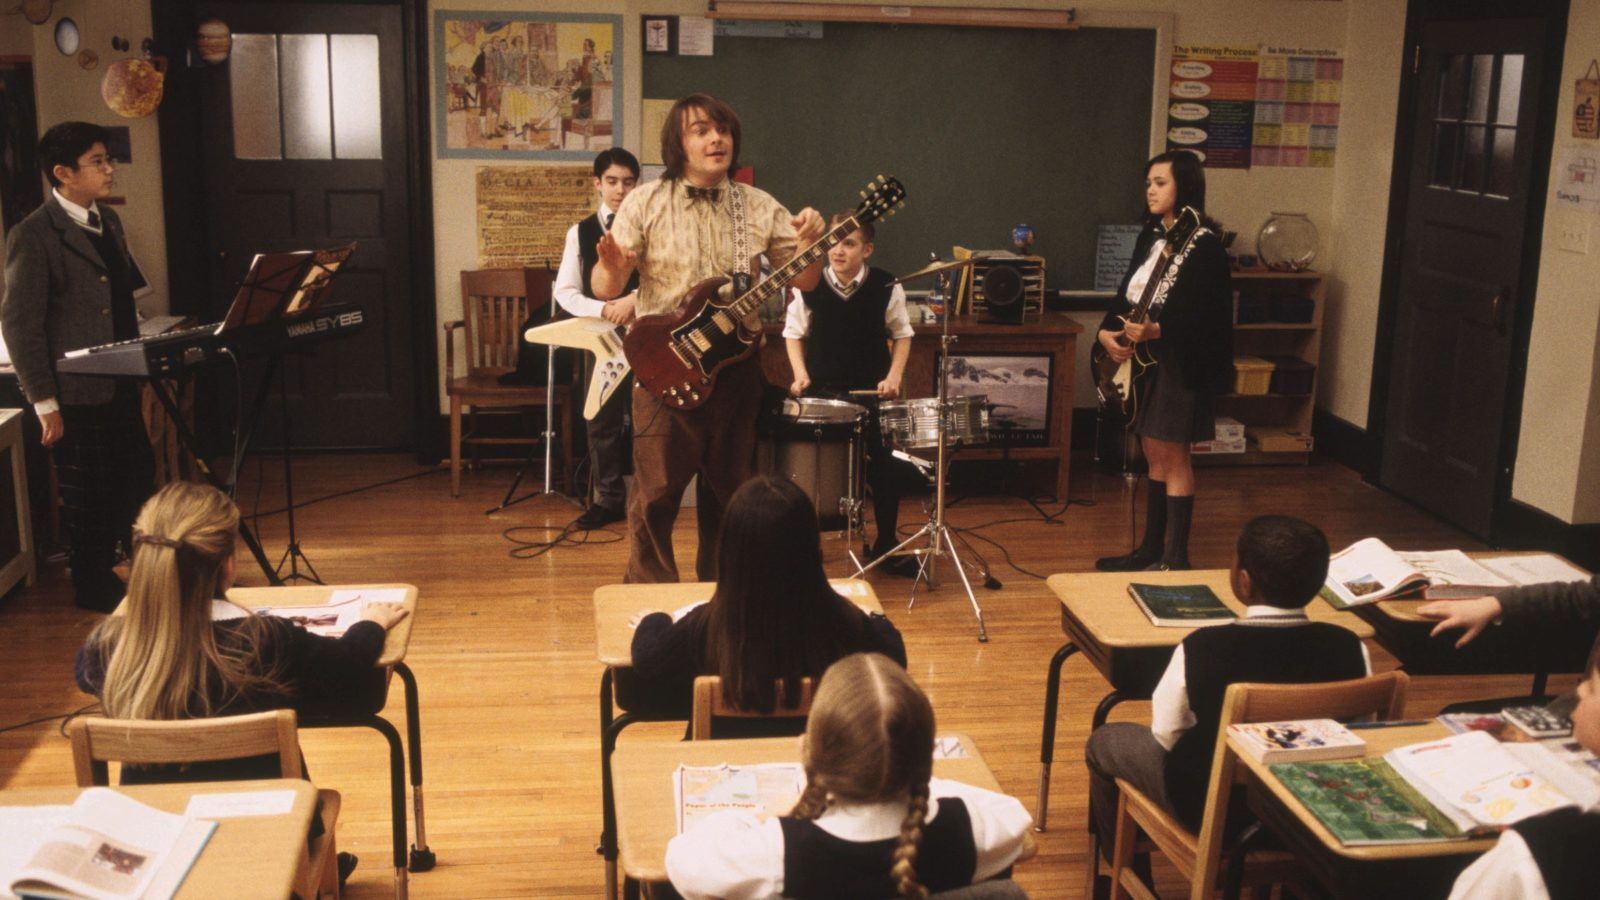 Encounters 2019: School of Rock | What's On | Bristol 24/7